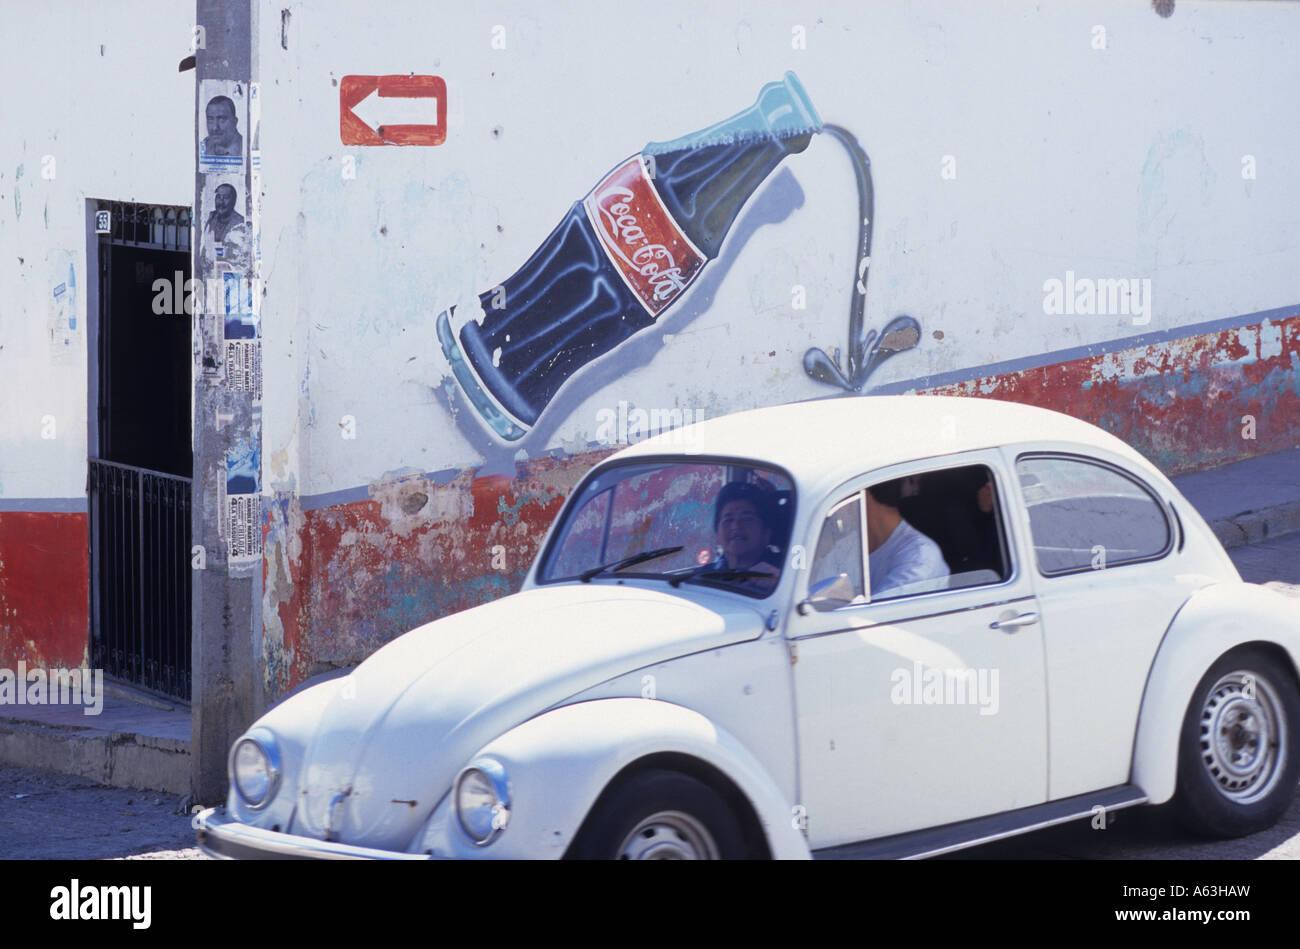 coke cola advert stockfotos coke cola advert bilder alamy. Black Bedroom Furniture Sets. Home Design Ideas